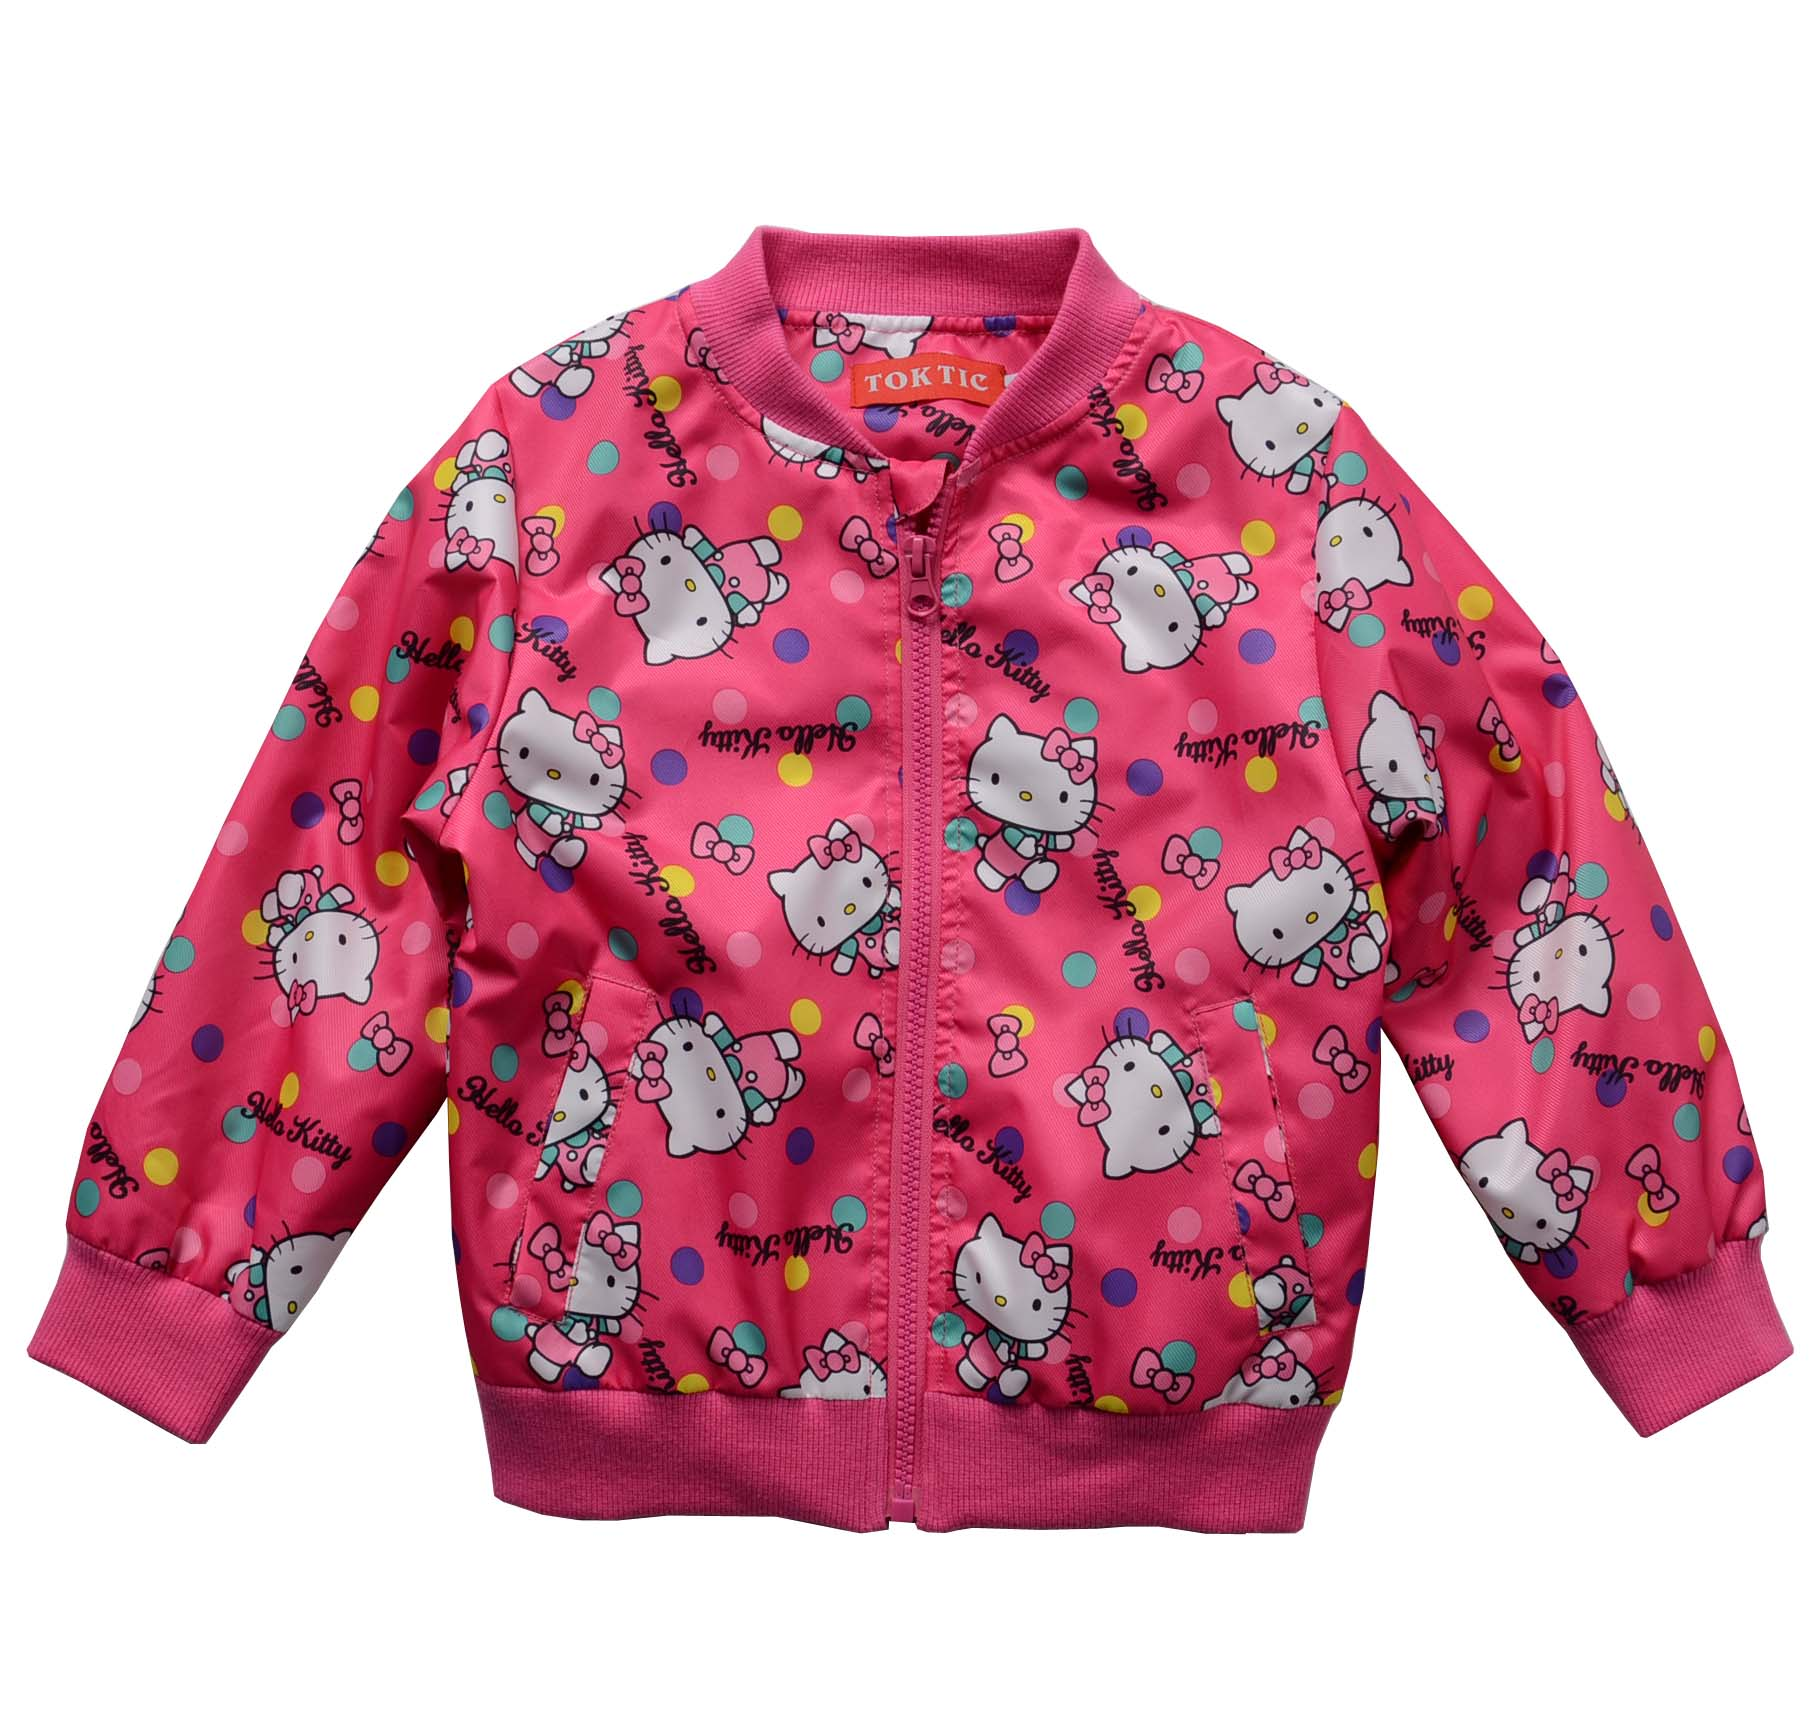 TOKTIC brand children girl cute cat casual jacket kids girl fashion outwear jacket kids spring coat